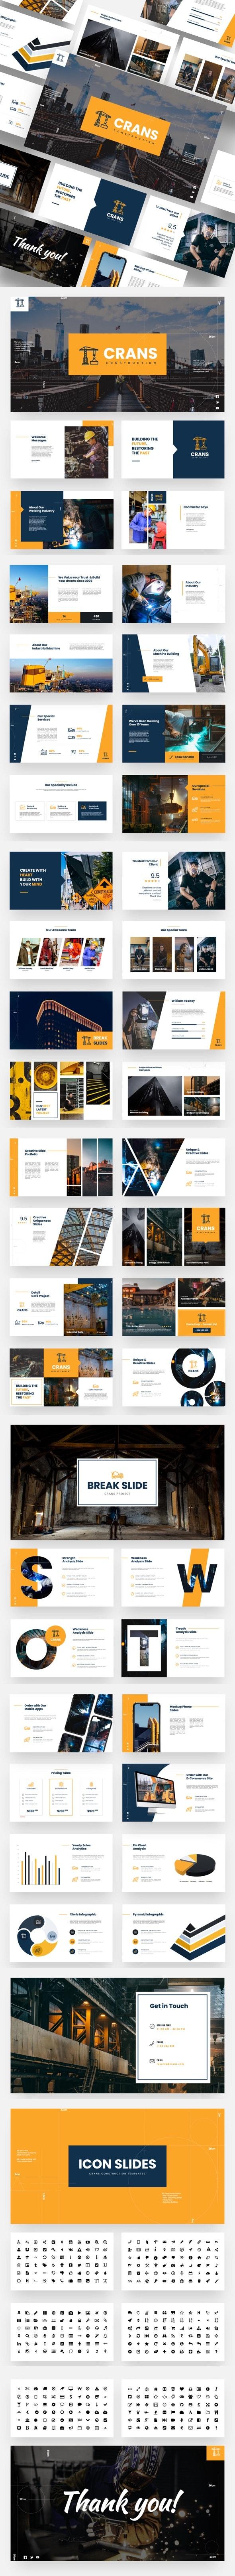 Crans - Construction & Industrial Google Slides Template - Google Slides Presentation Templates